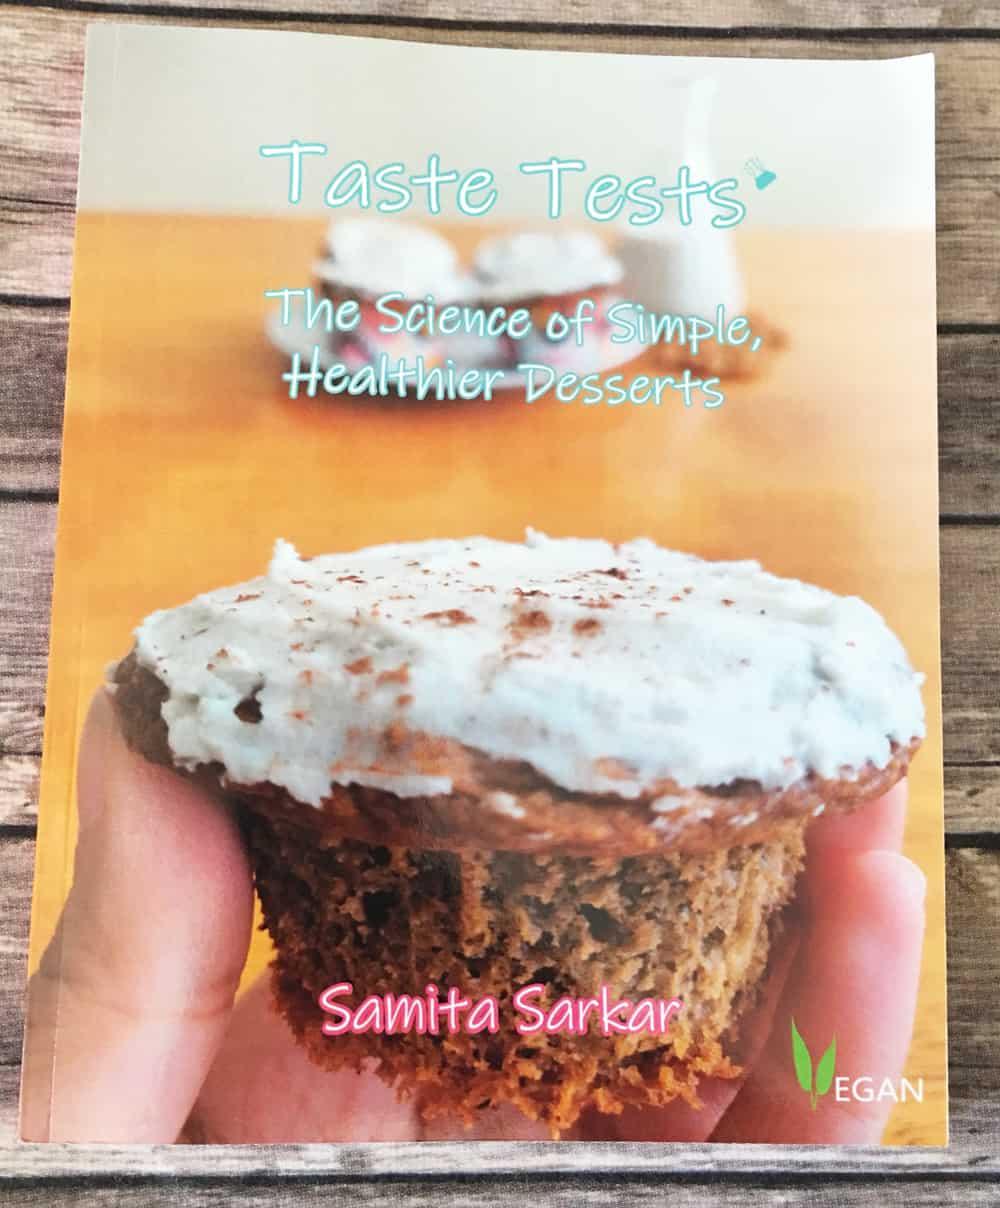 Taste Tests: The Science of Simple Healthier Desserts with Samita Sarkar